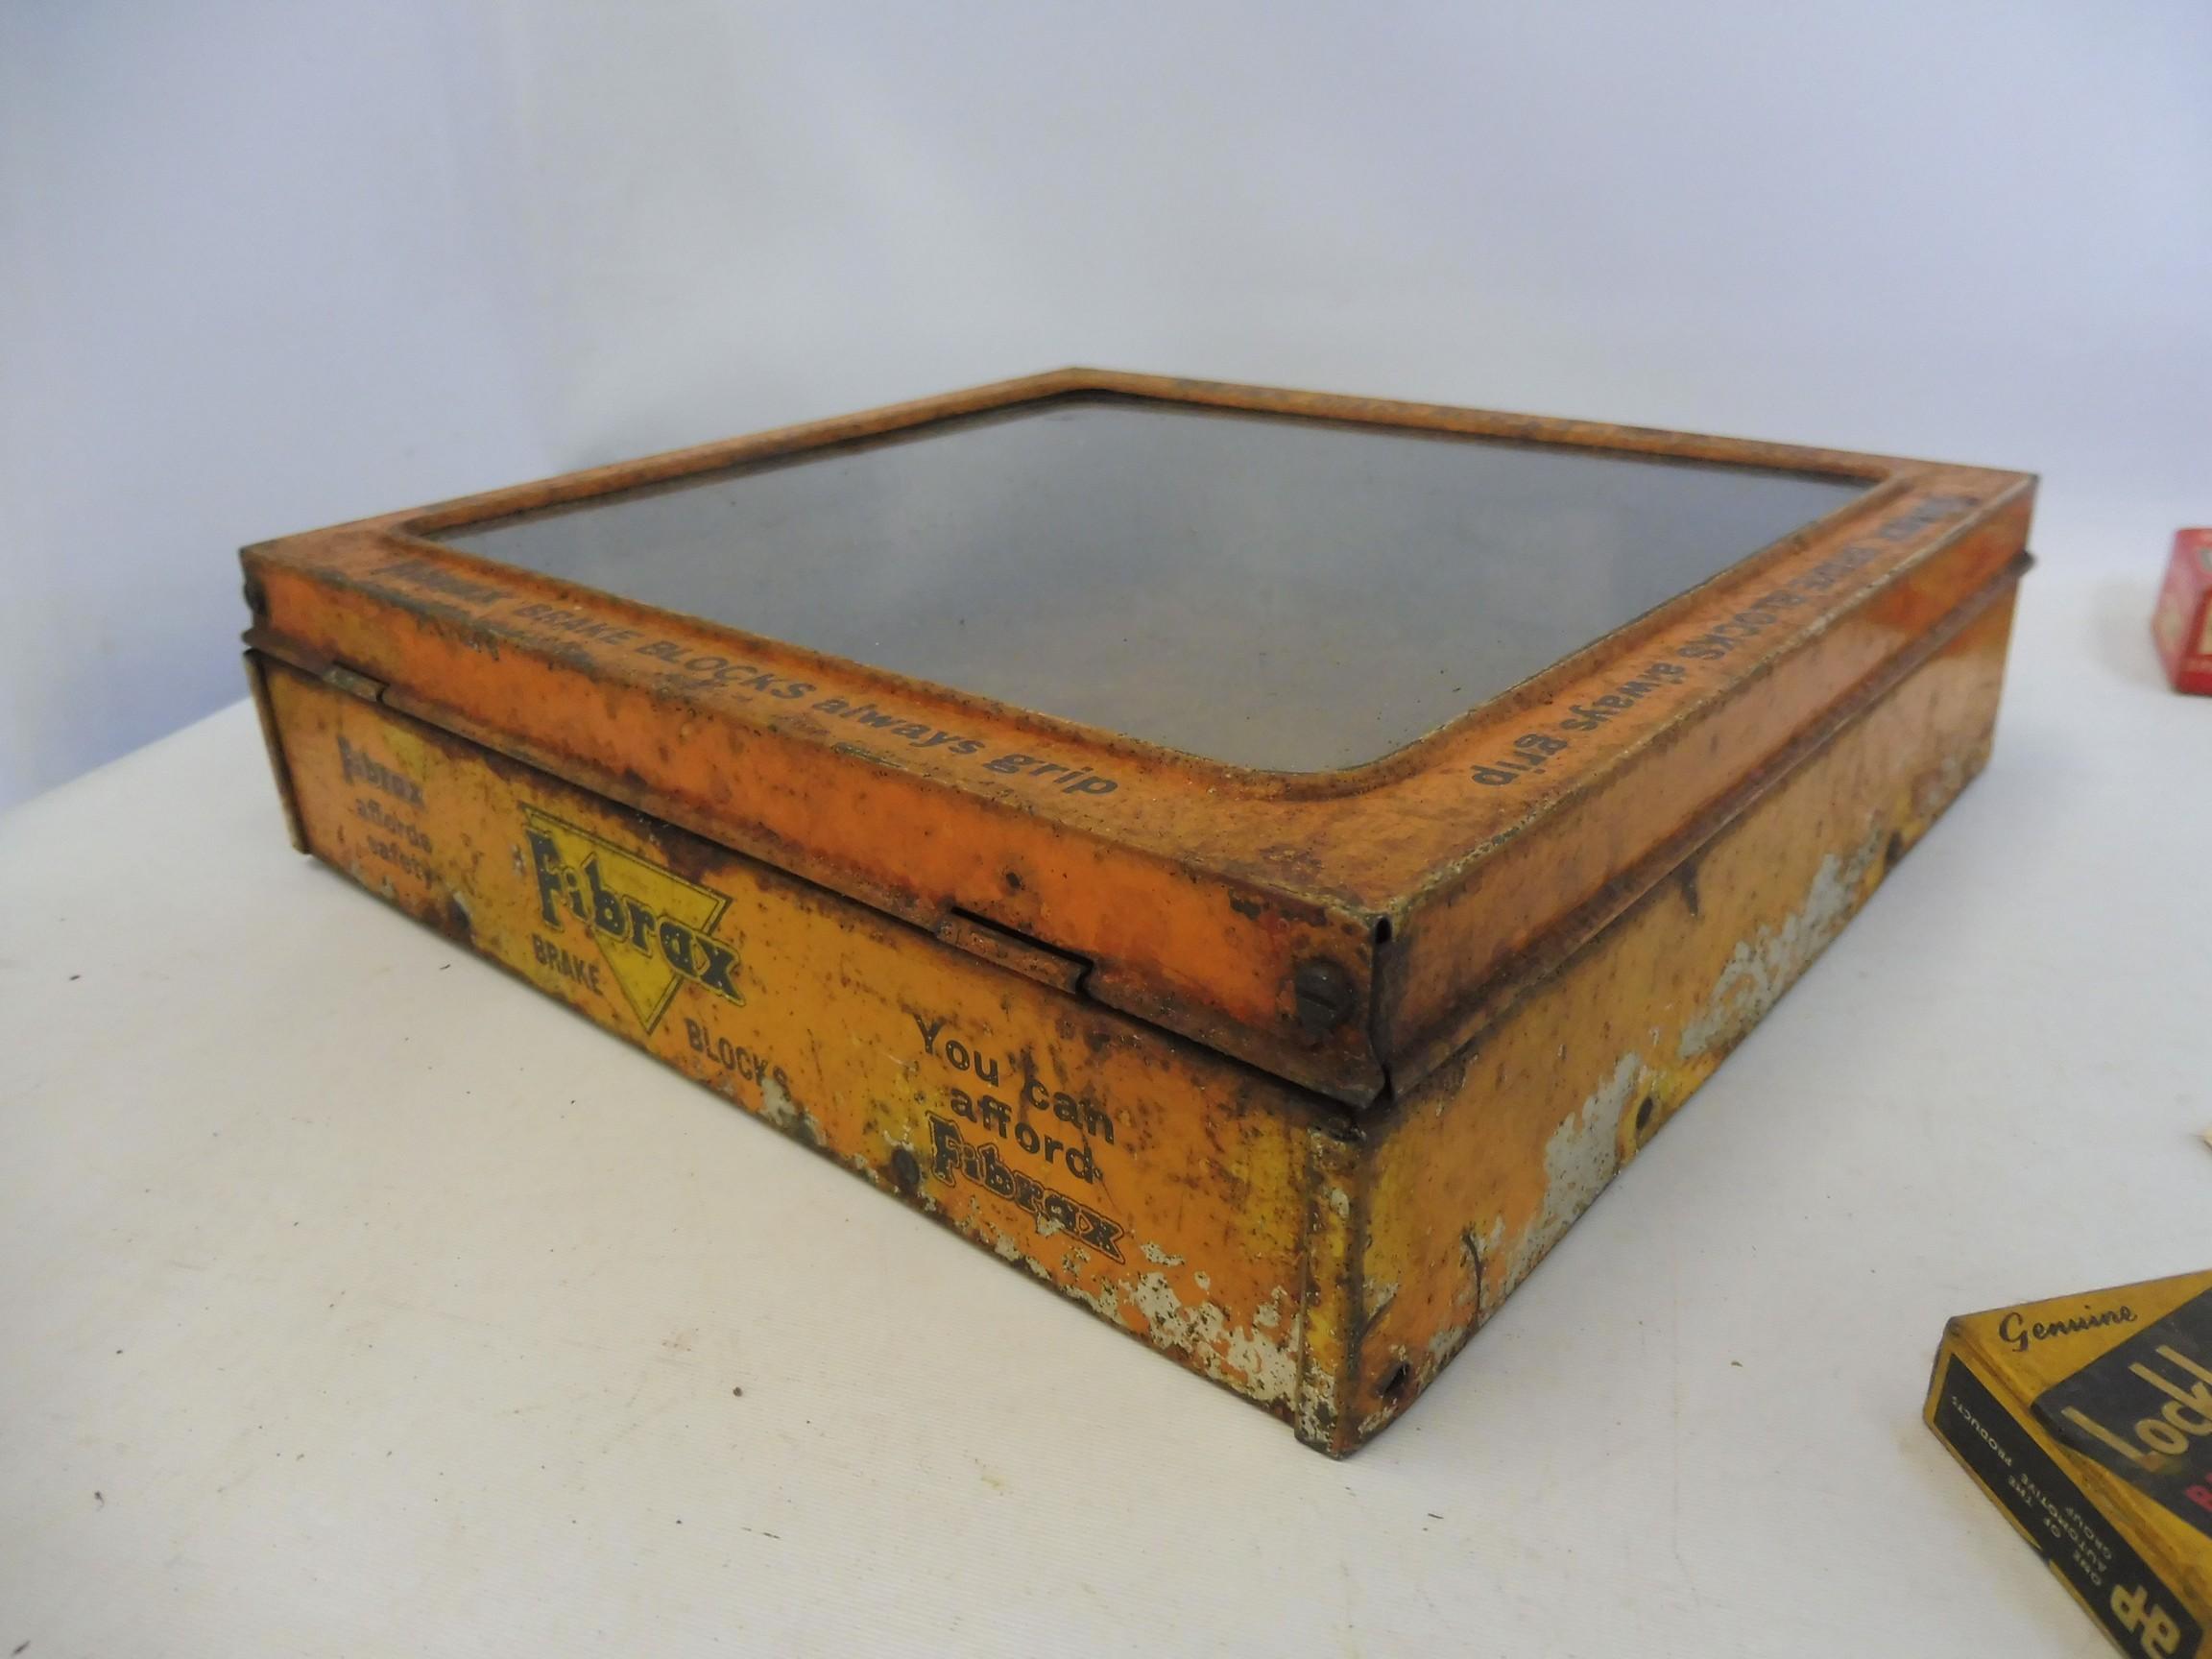 A Fibrax Brake Blocks dispensing tin with mixed contents. - Image 6 of 8